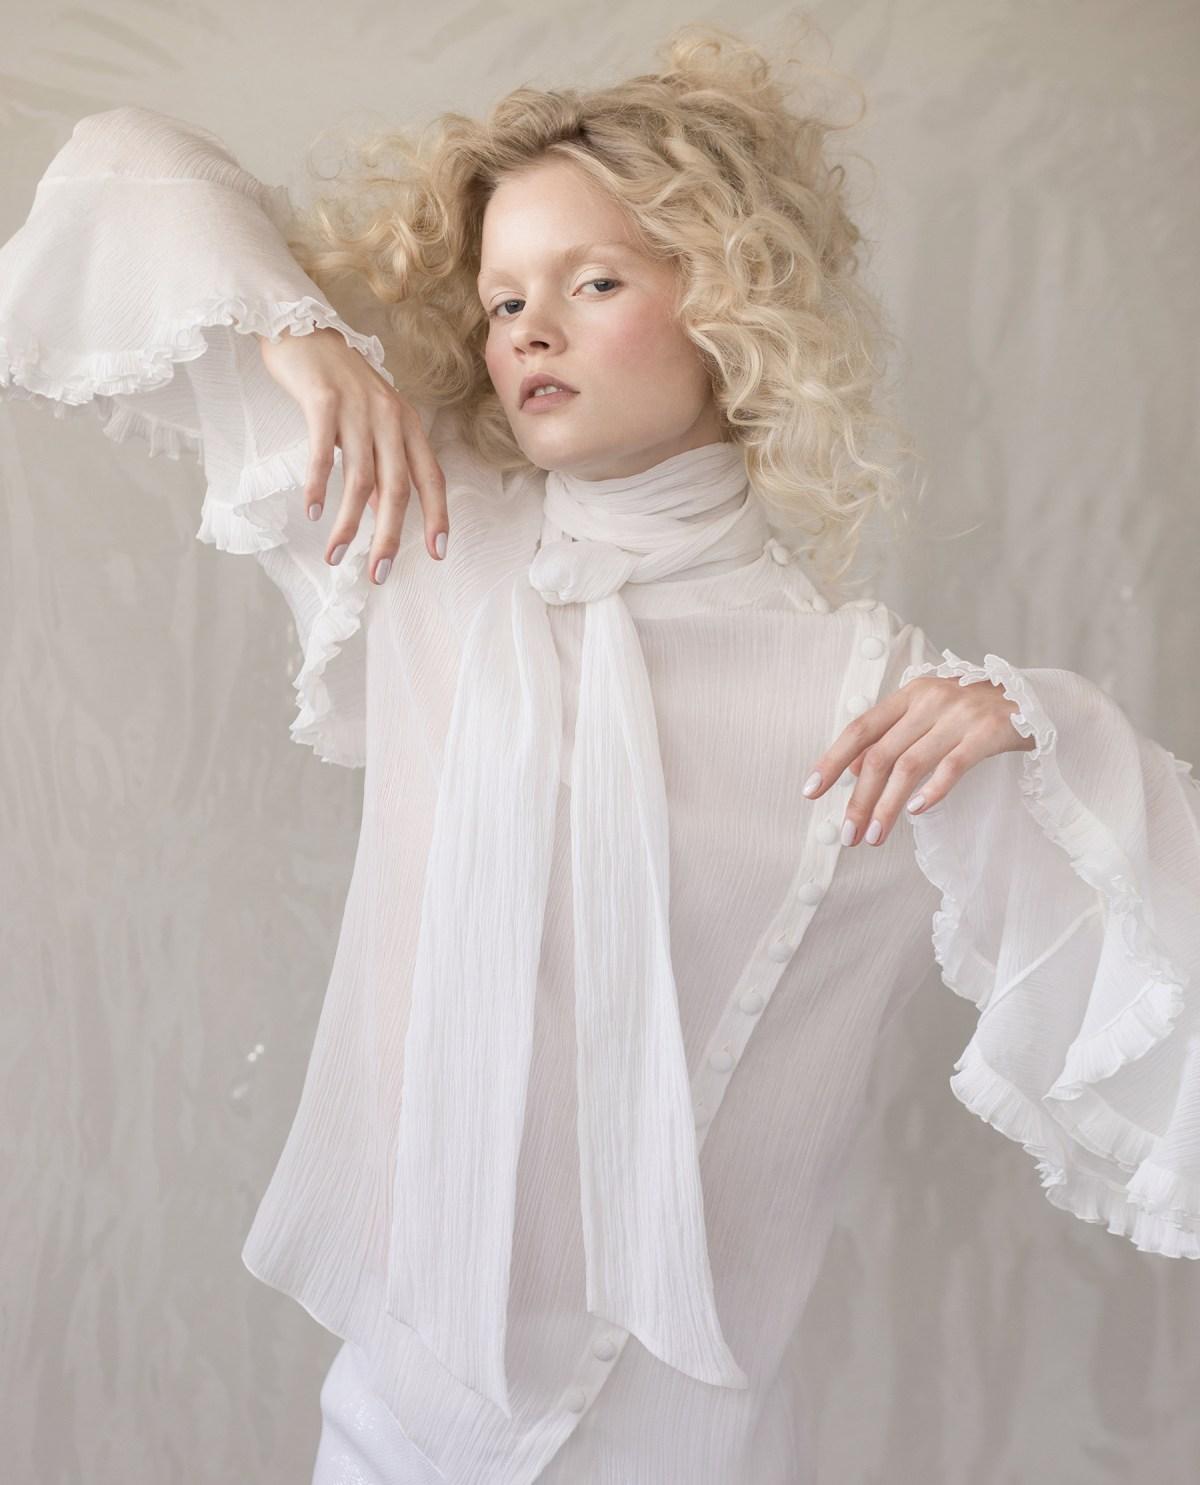 Blond model wearing a white Chloé blouse